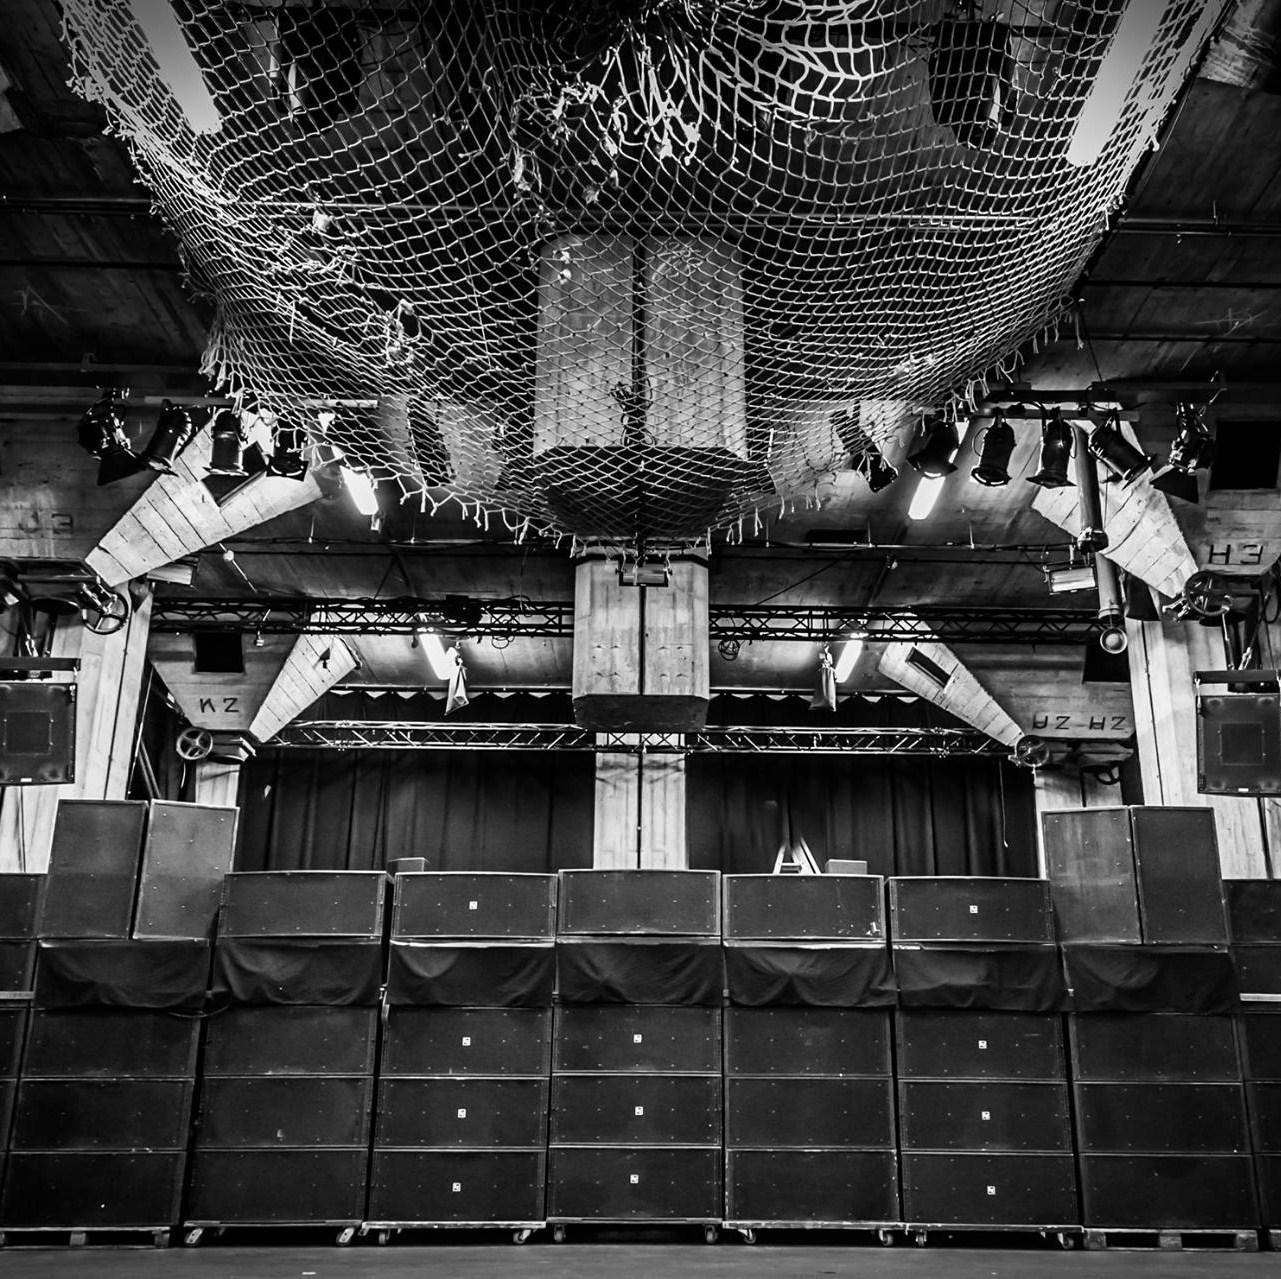 rotterdamse-rave-indoor